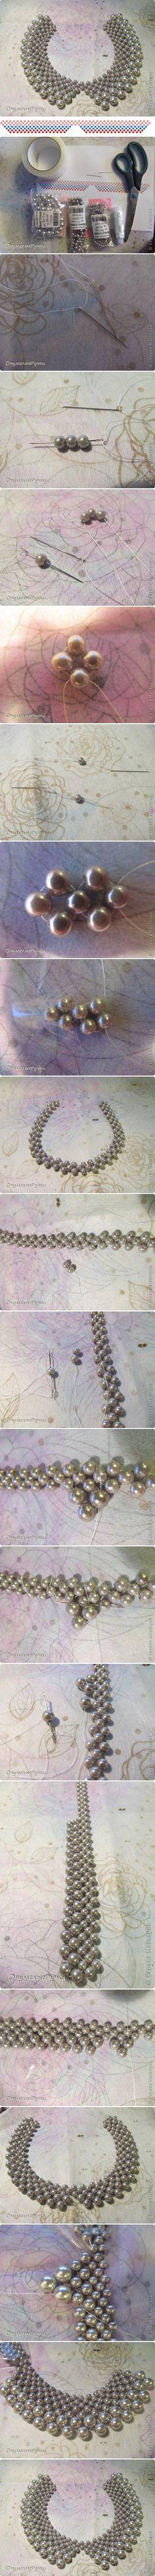 DIY Collar of Beads Necklace DIY Collar of Beads Necklace